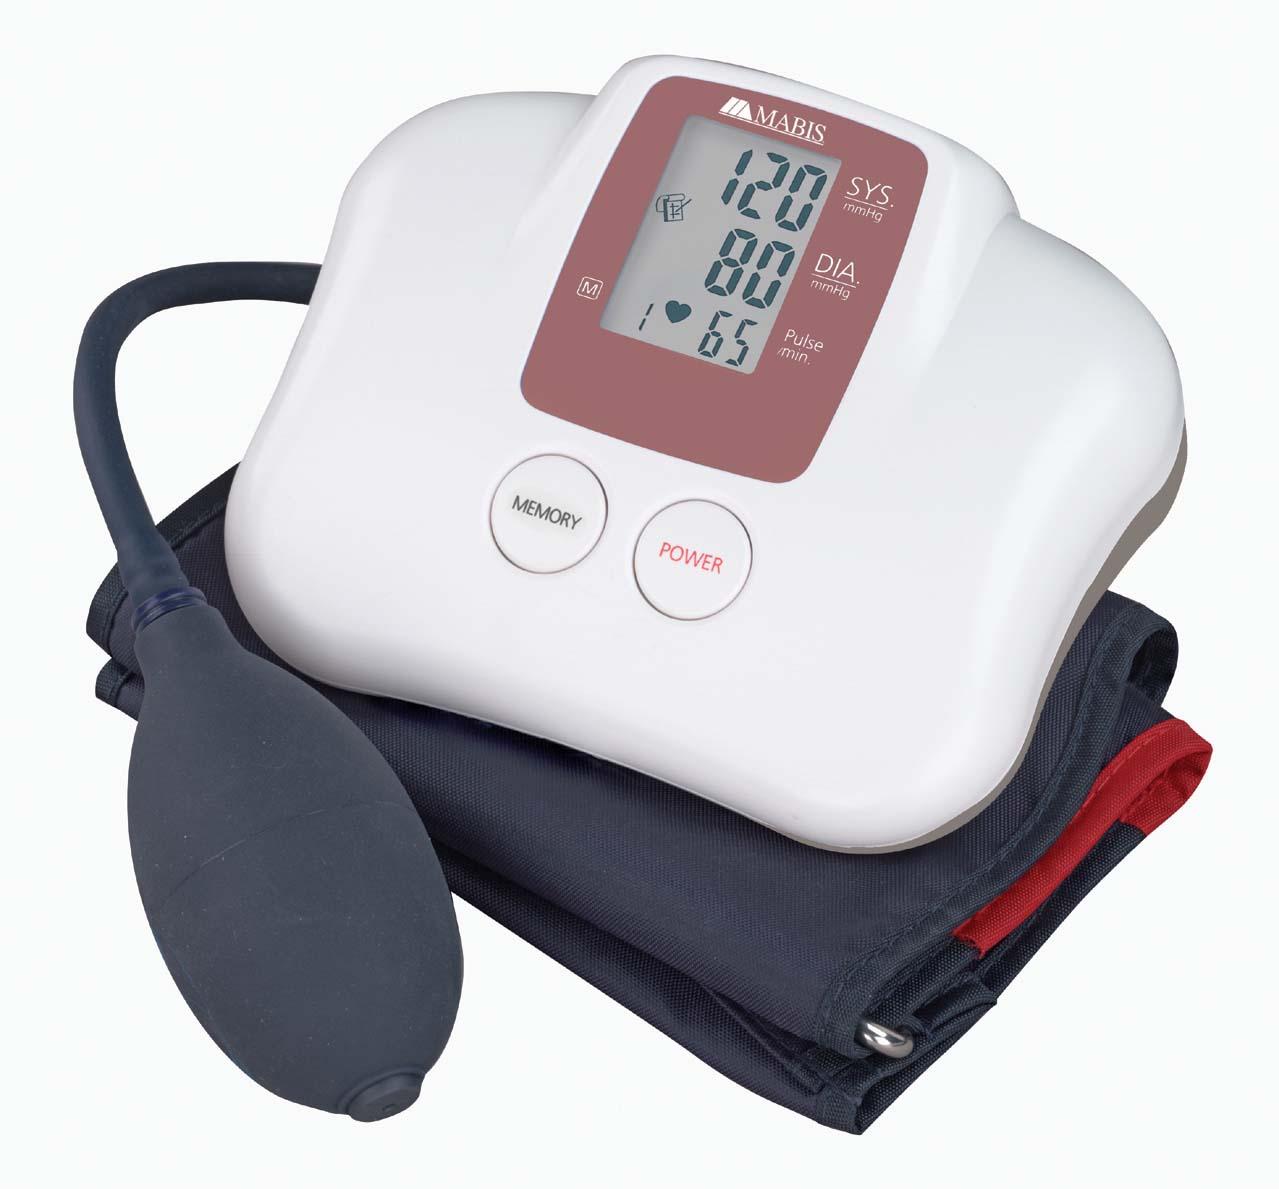 semi-automatic-digital-blood-pressure-monitor-with-memory-large-adult-04-263-006-lr.jpg